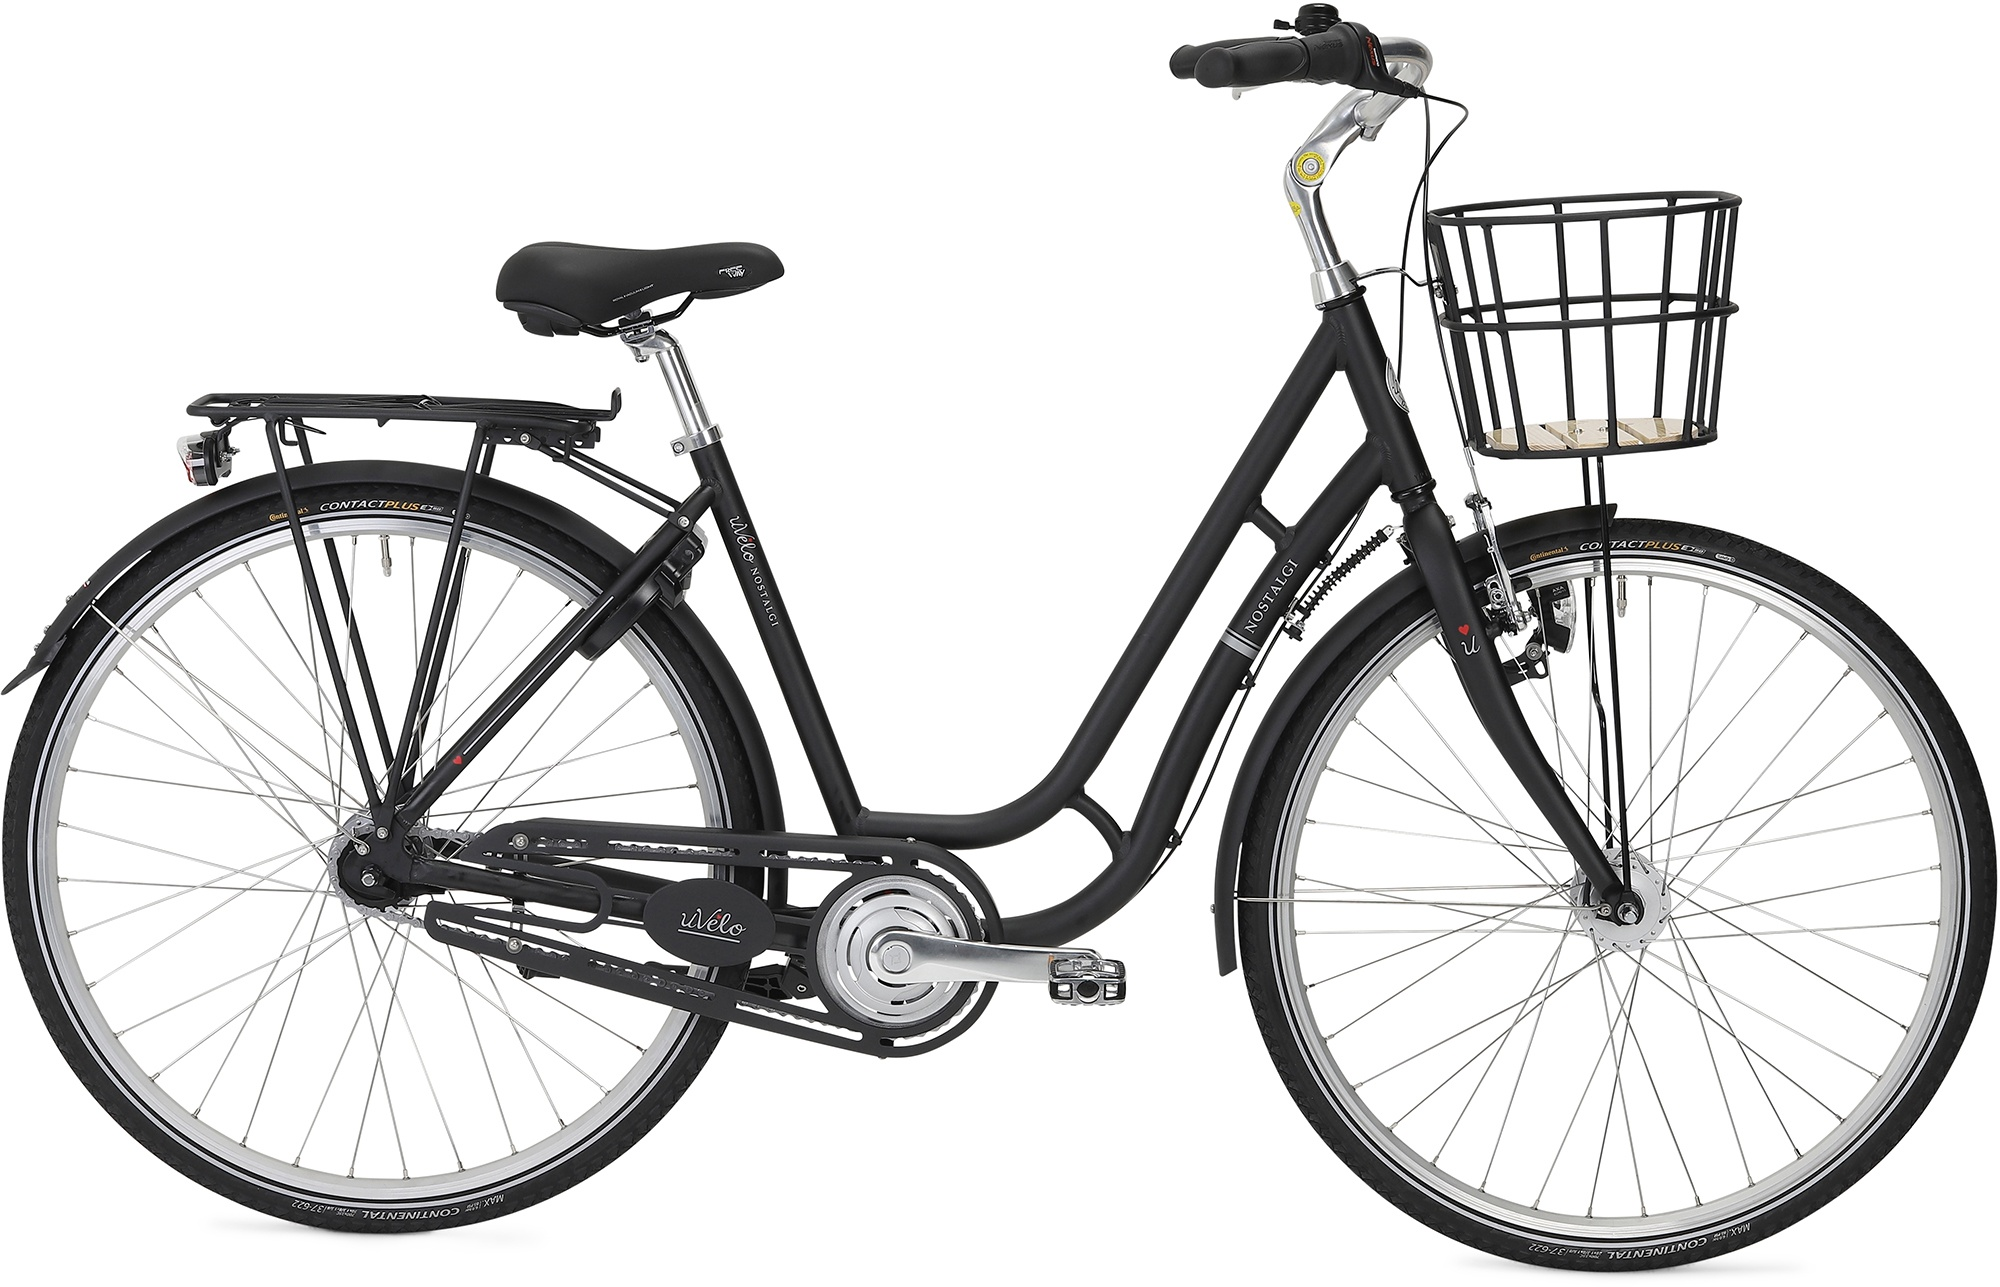 uVélo Nostalgi 7g Dame 2021 - Mat Sort  »  Bike Size: 55cm